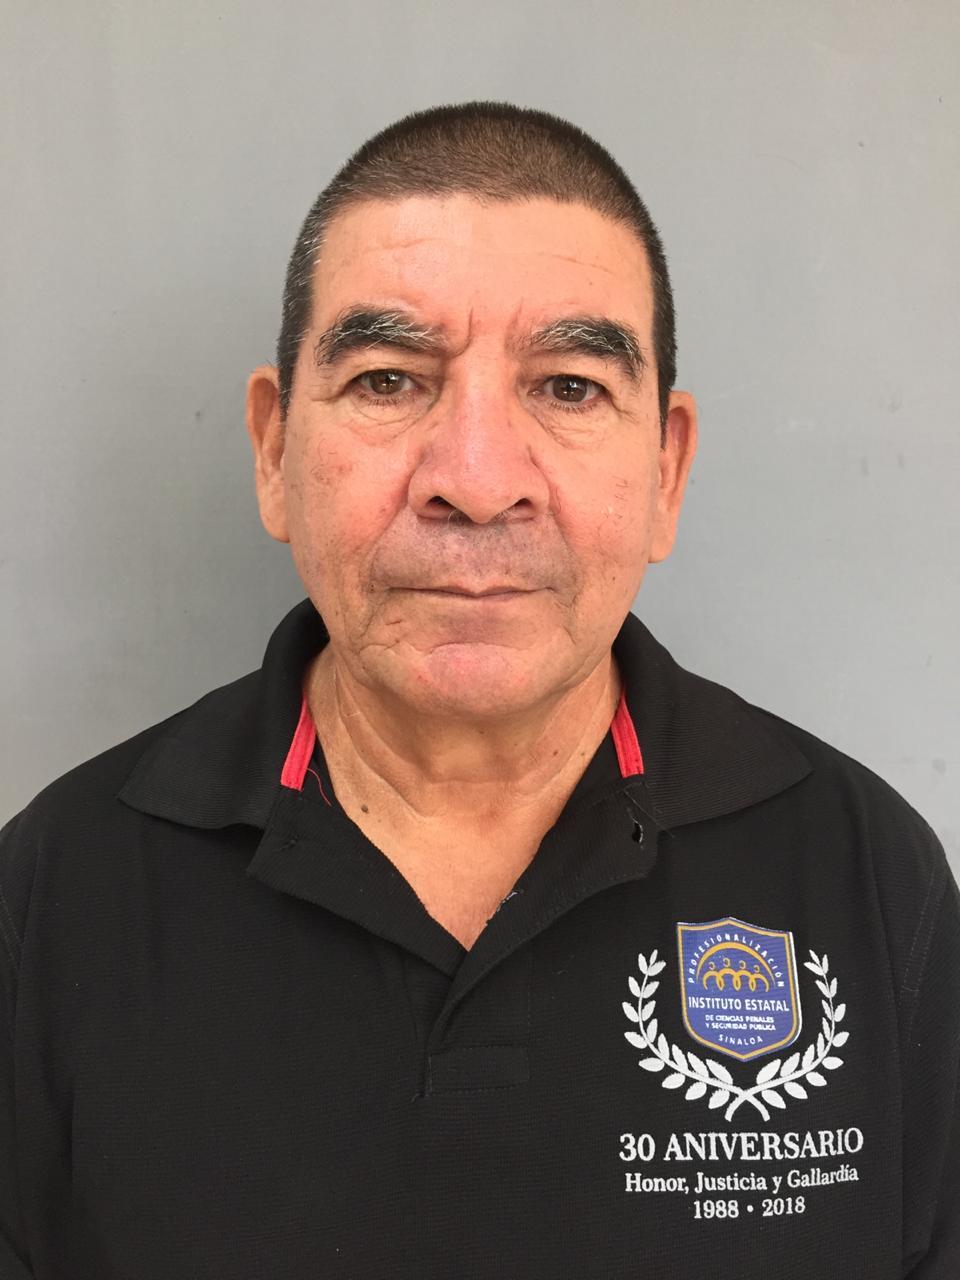 Anatolio Espinoza Santiesteban